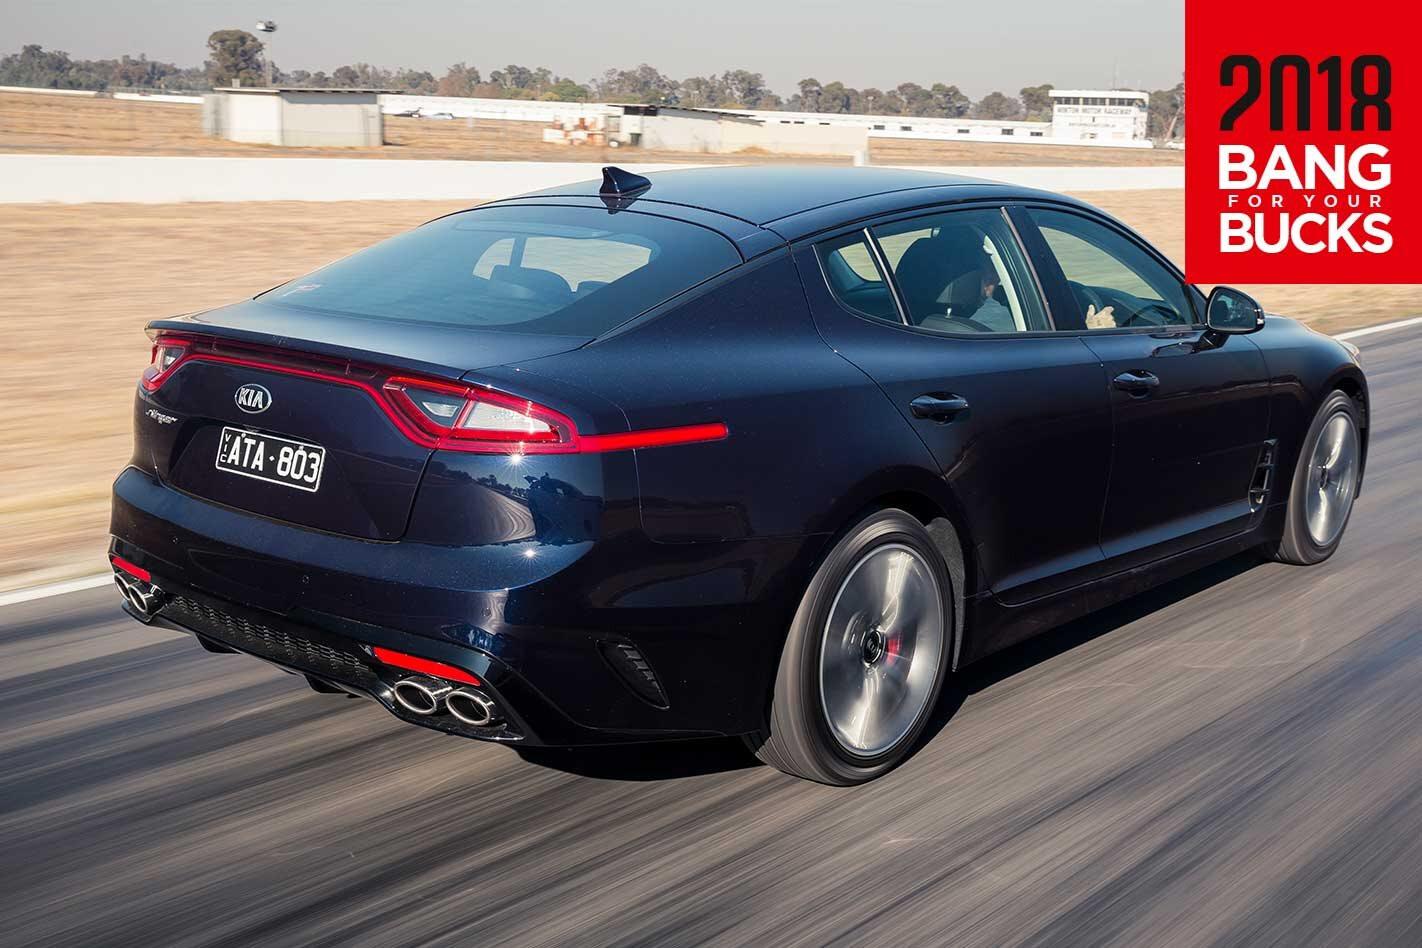 2018 Kia Stinger 330S track review